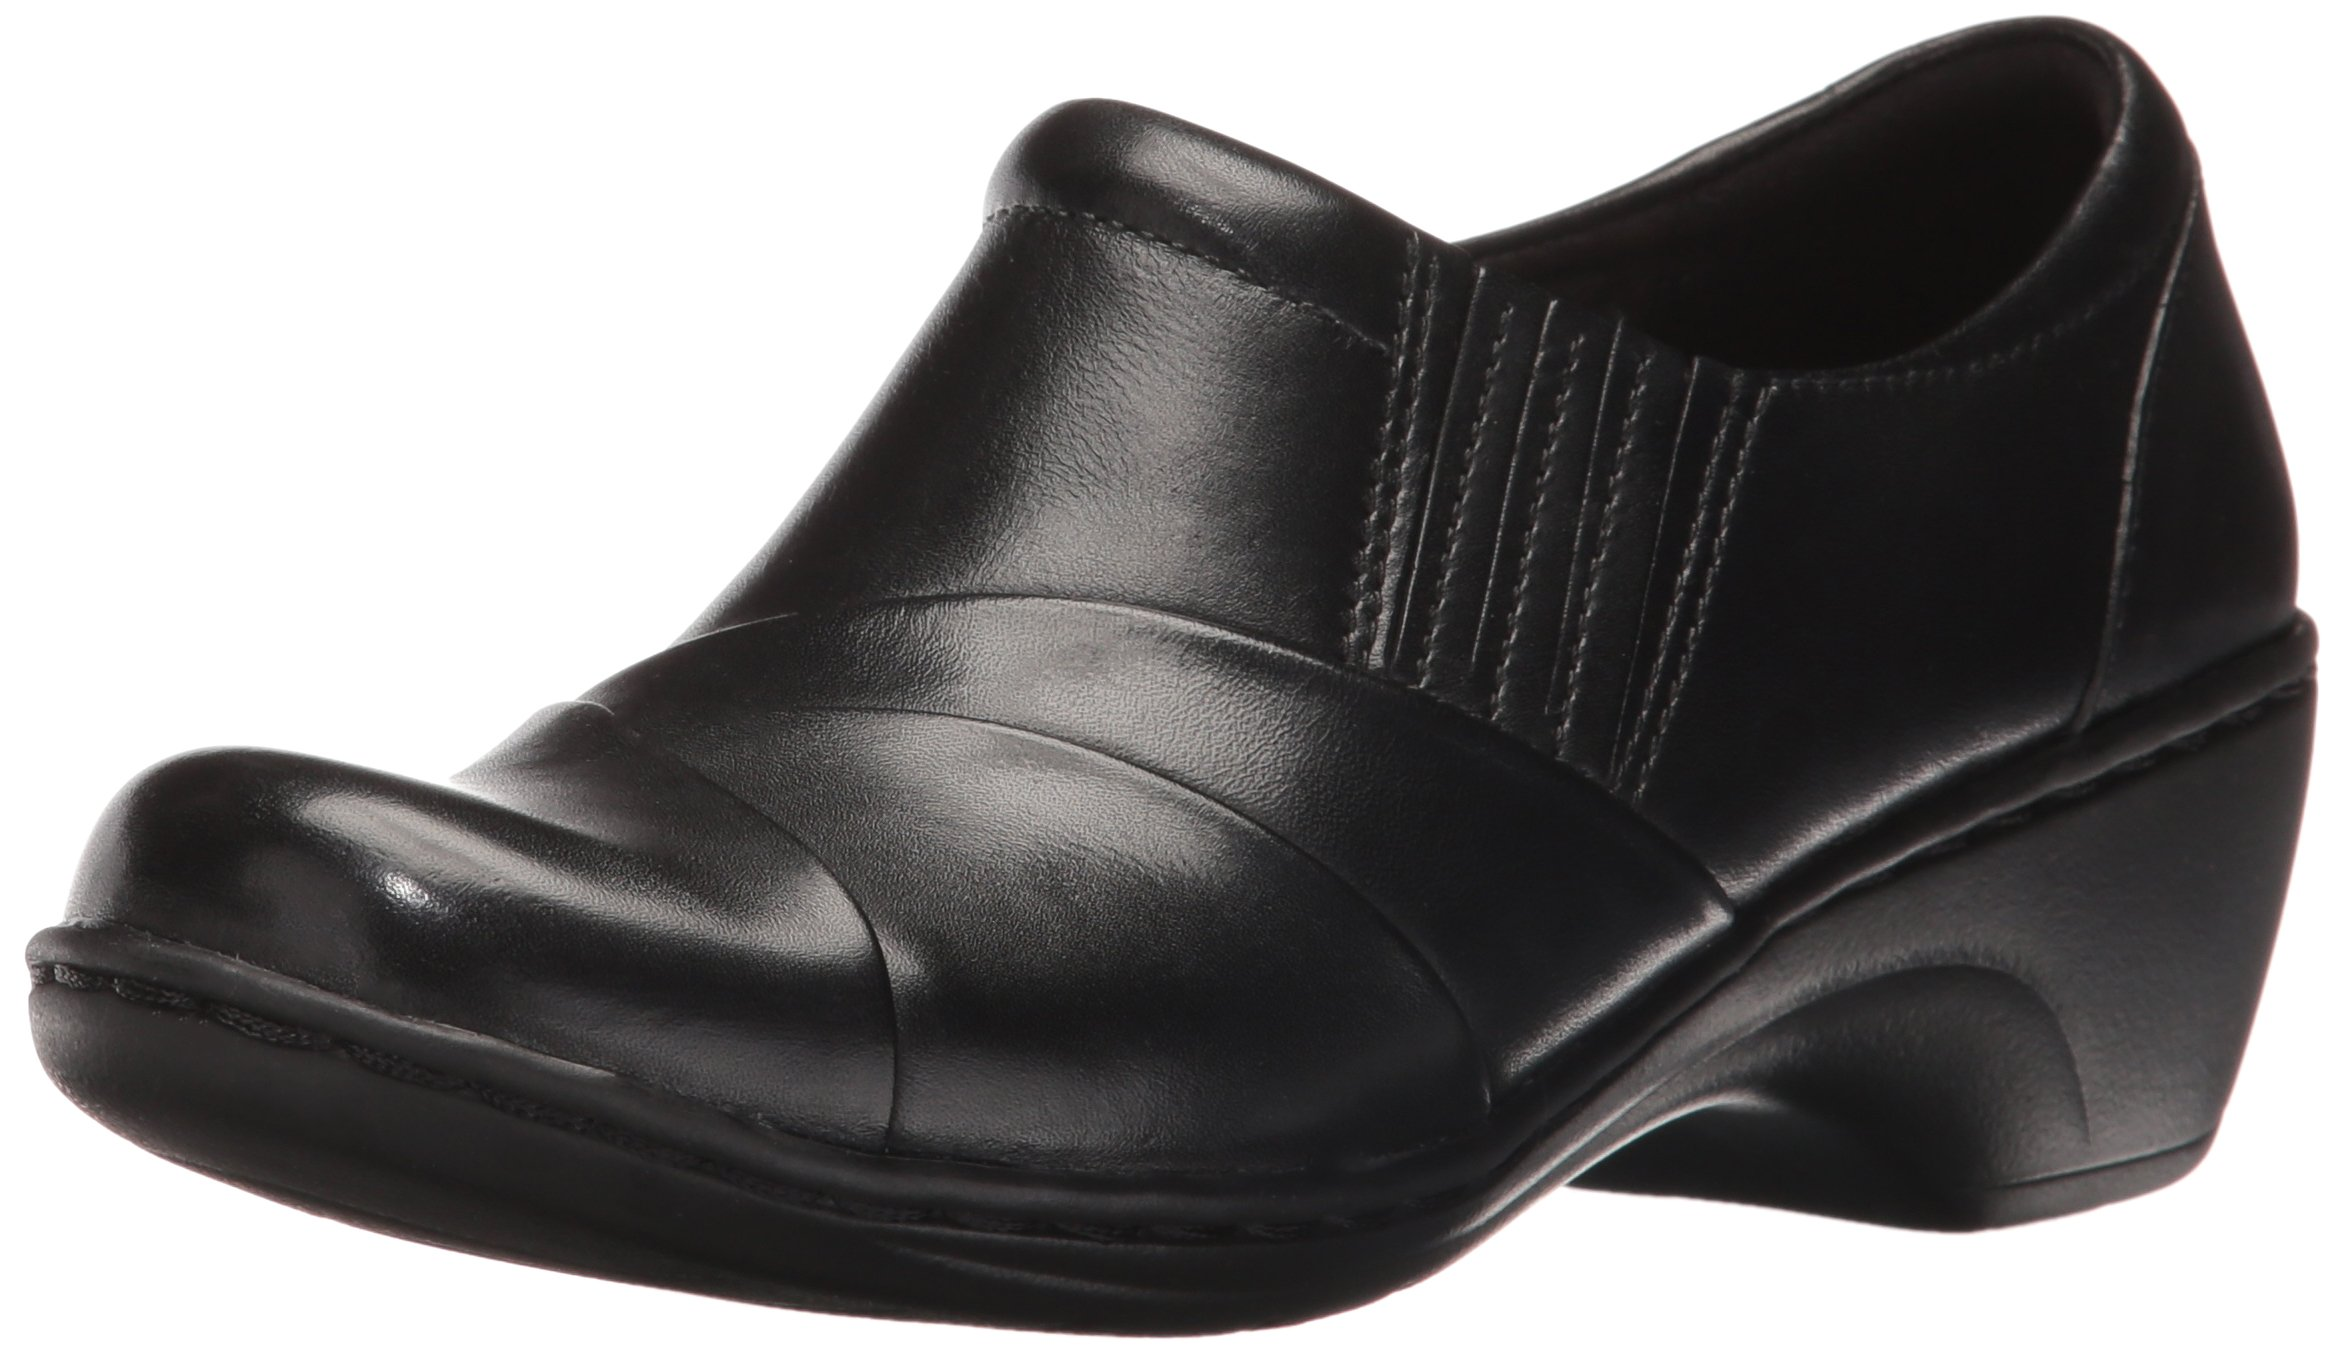 CLARKS Women's Channing Essa Slip-on Loafer, Black, 10 M US by CLARKS